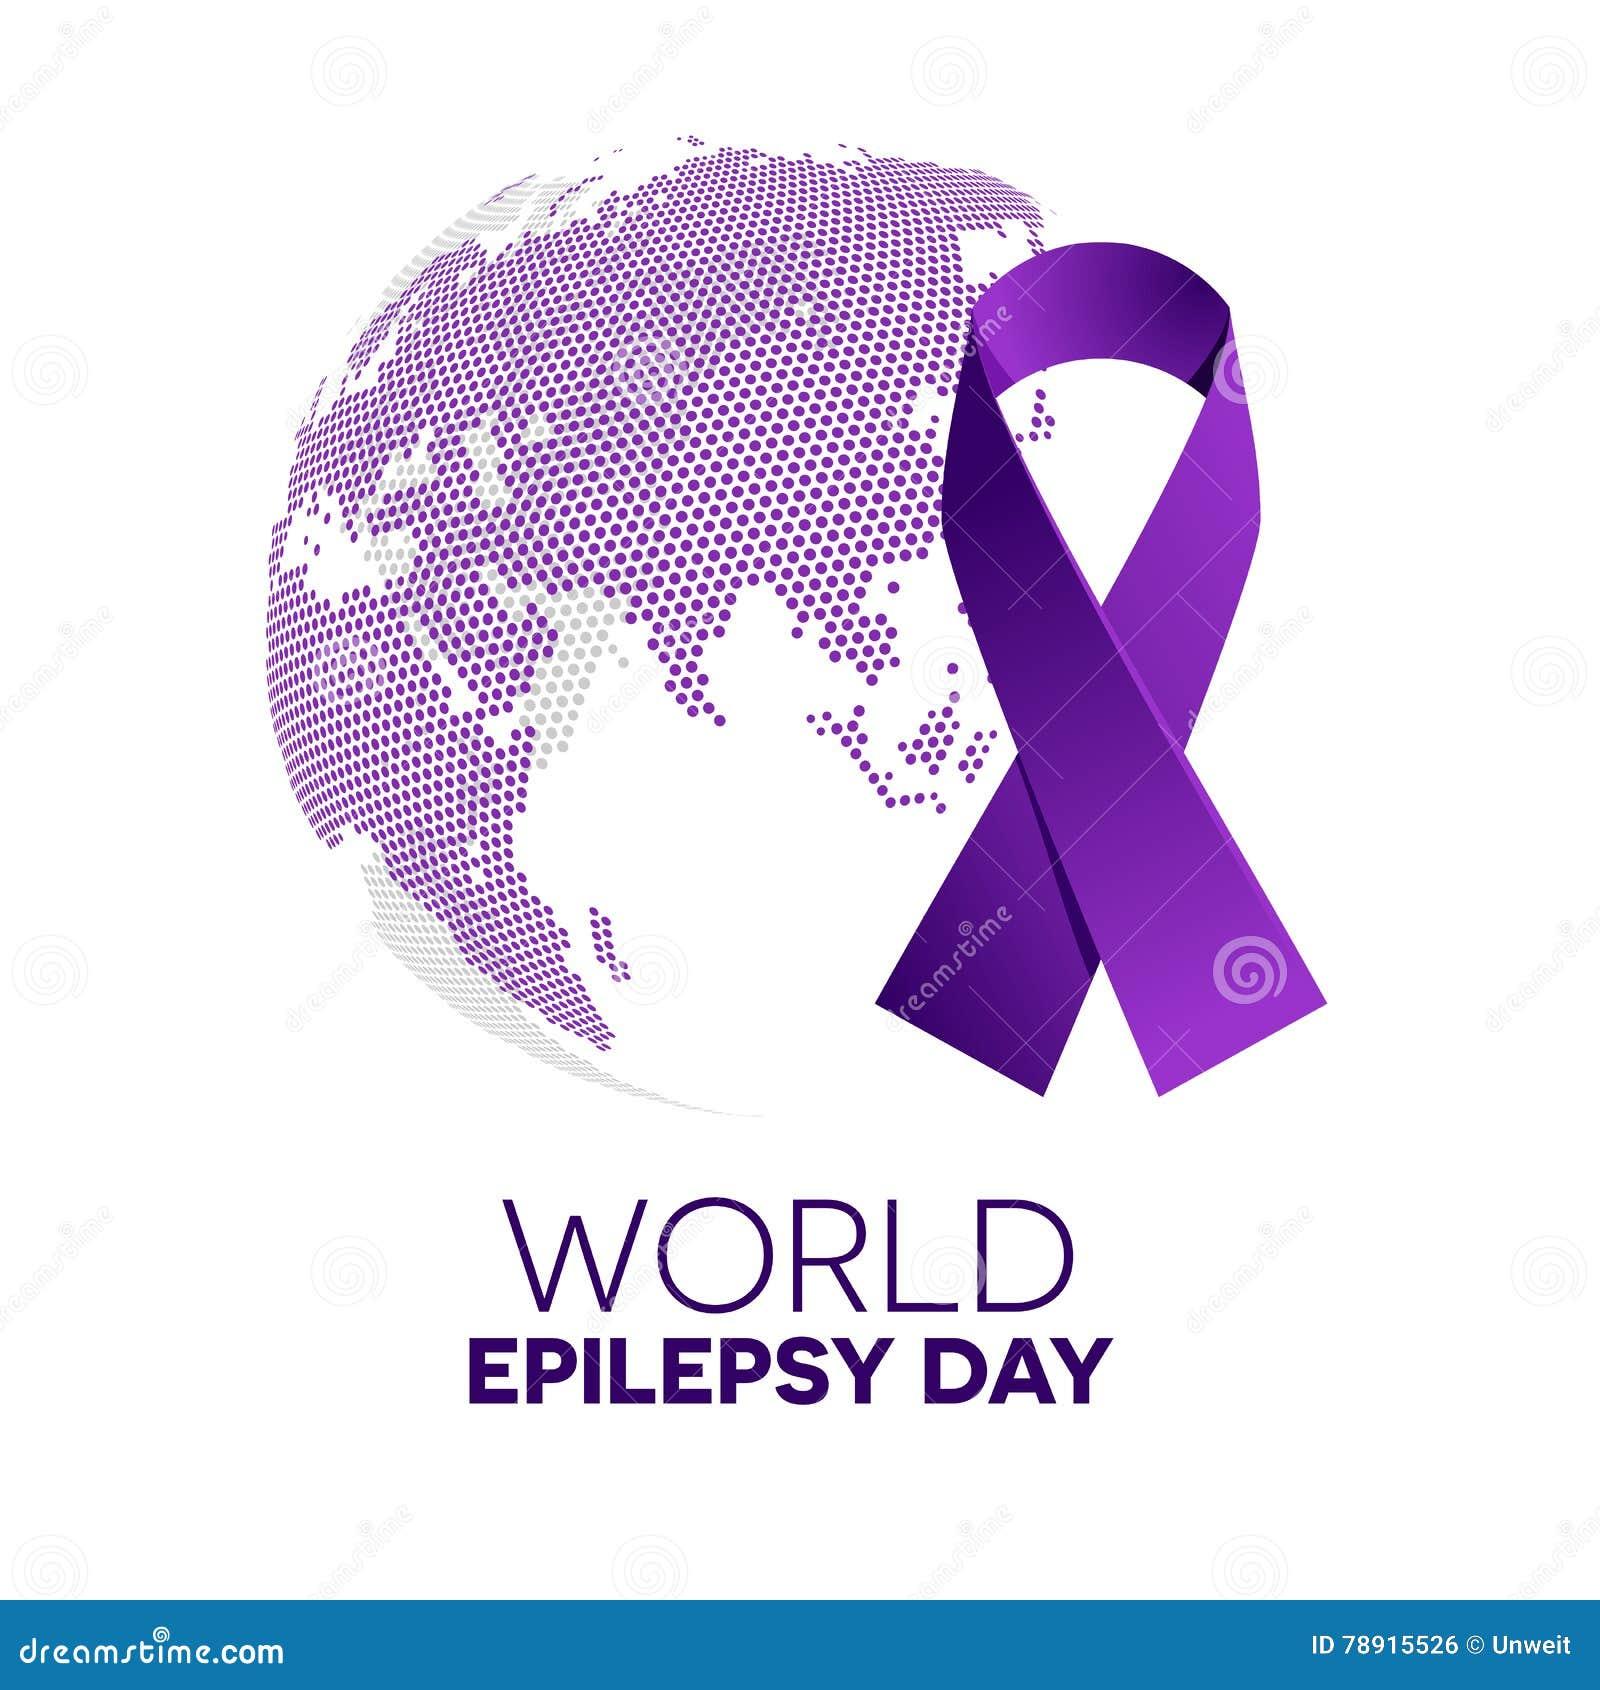 564e8791138 Purple ribbon made of dots on white background. World epilepsy solidarity  day. Purple epilepsy awareness ribbon. Isolated vector illustration.